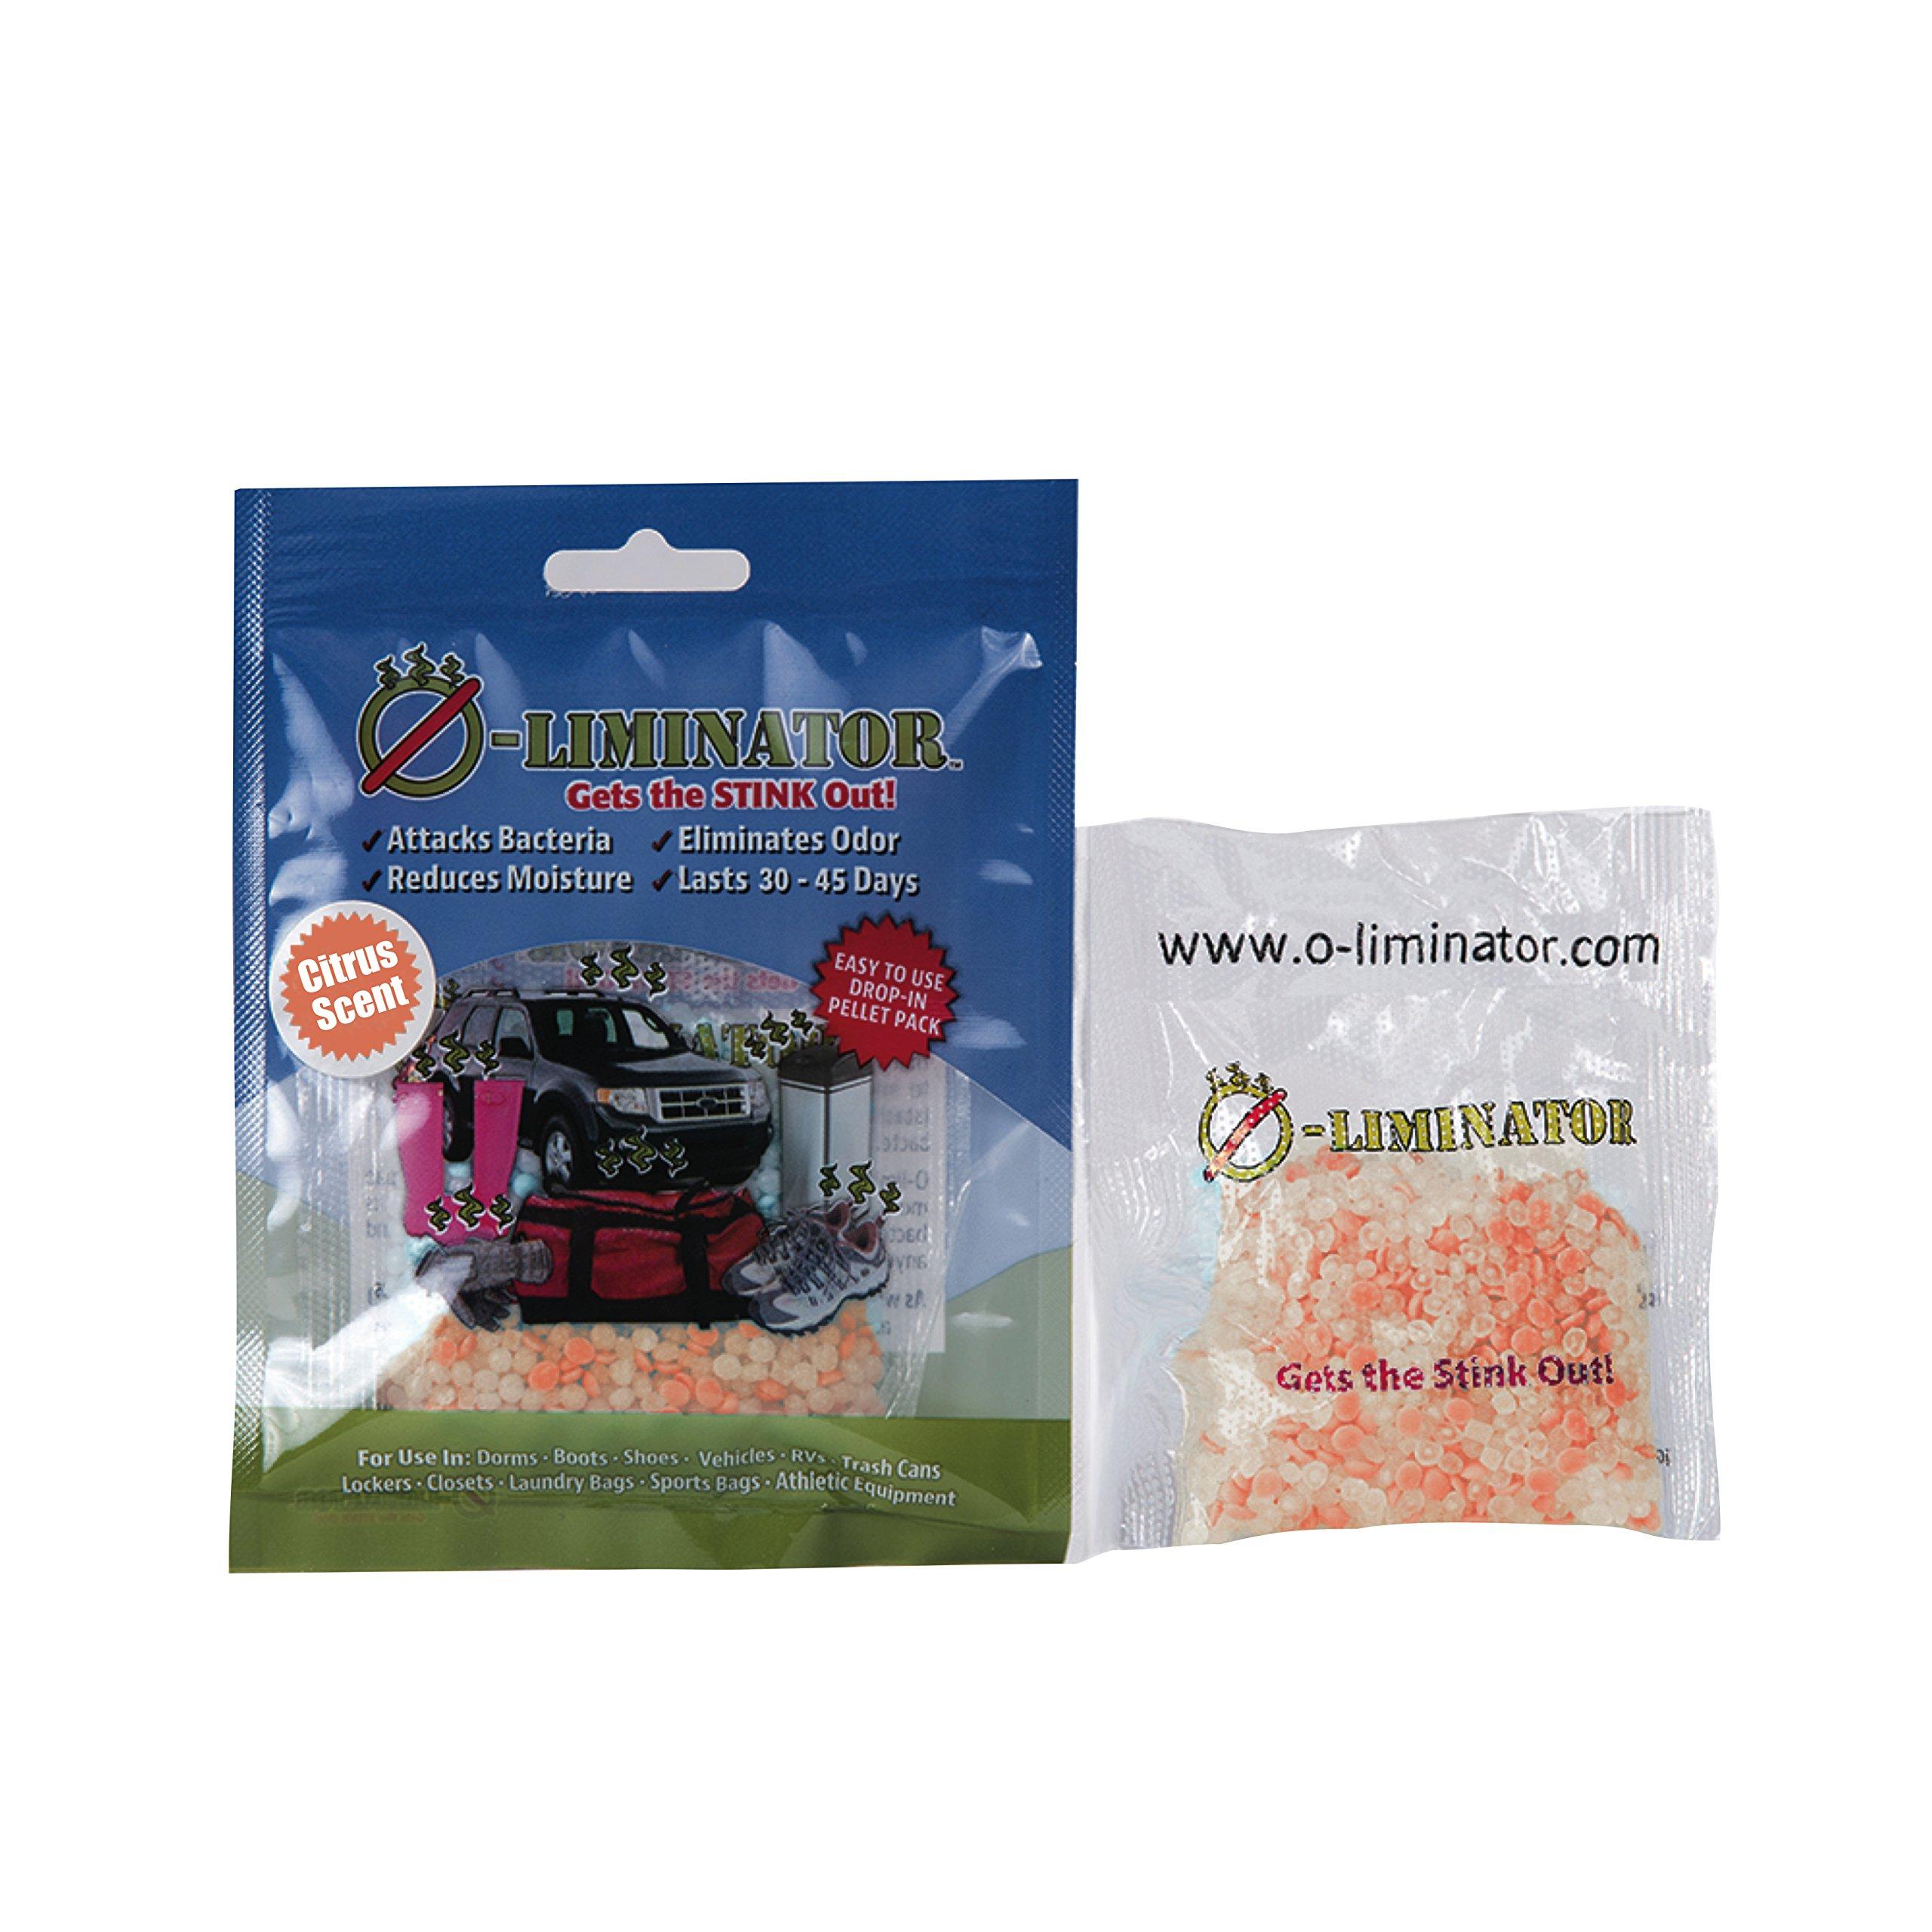 O-Liminator Soft Citrus 892626002250 Odor Eliminator (1 Pack)